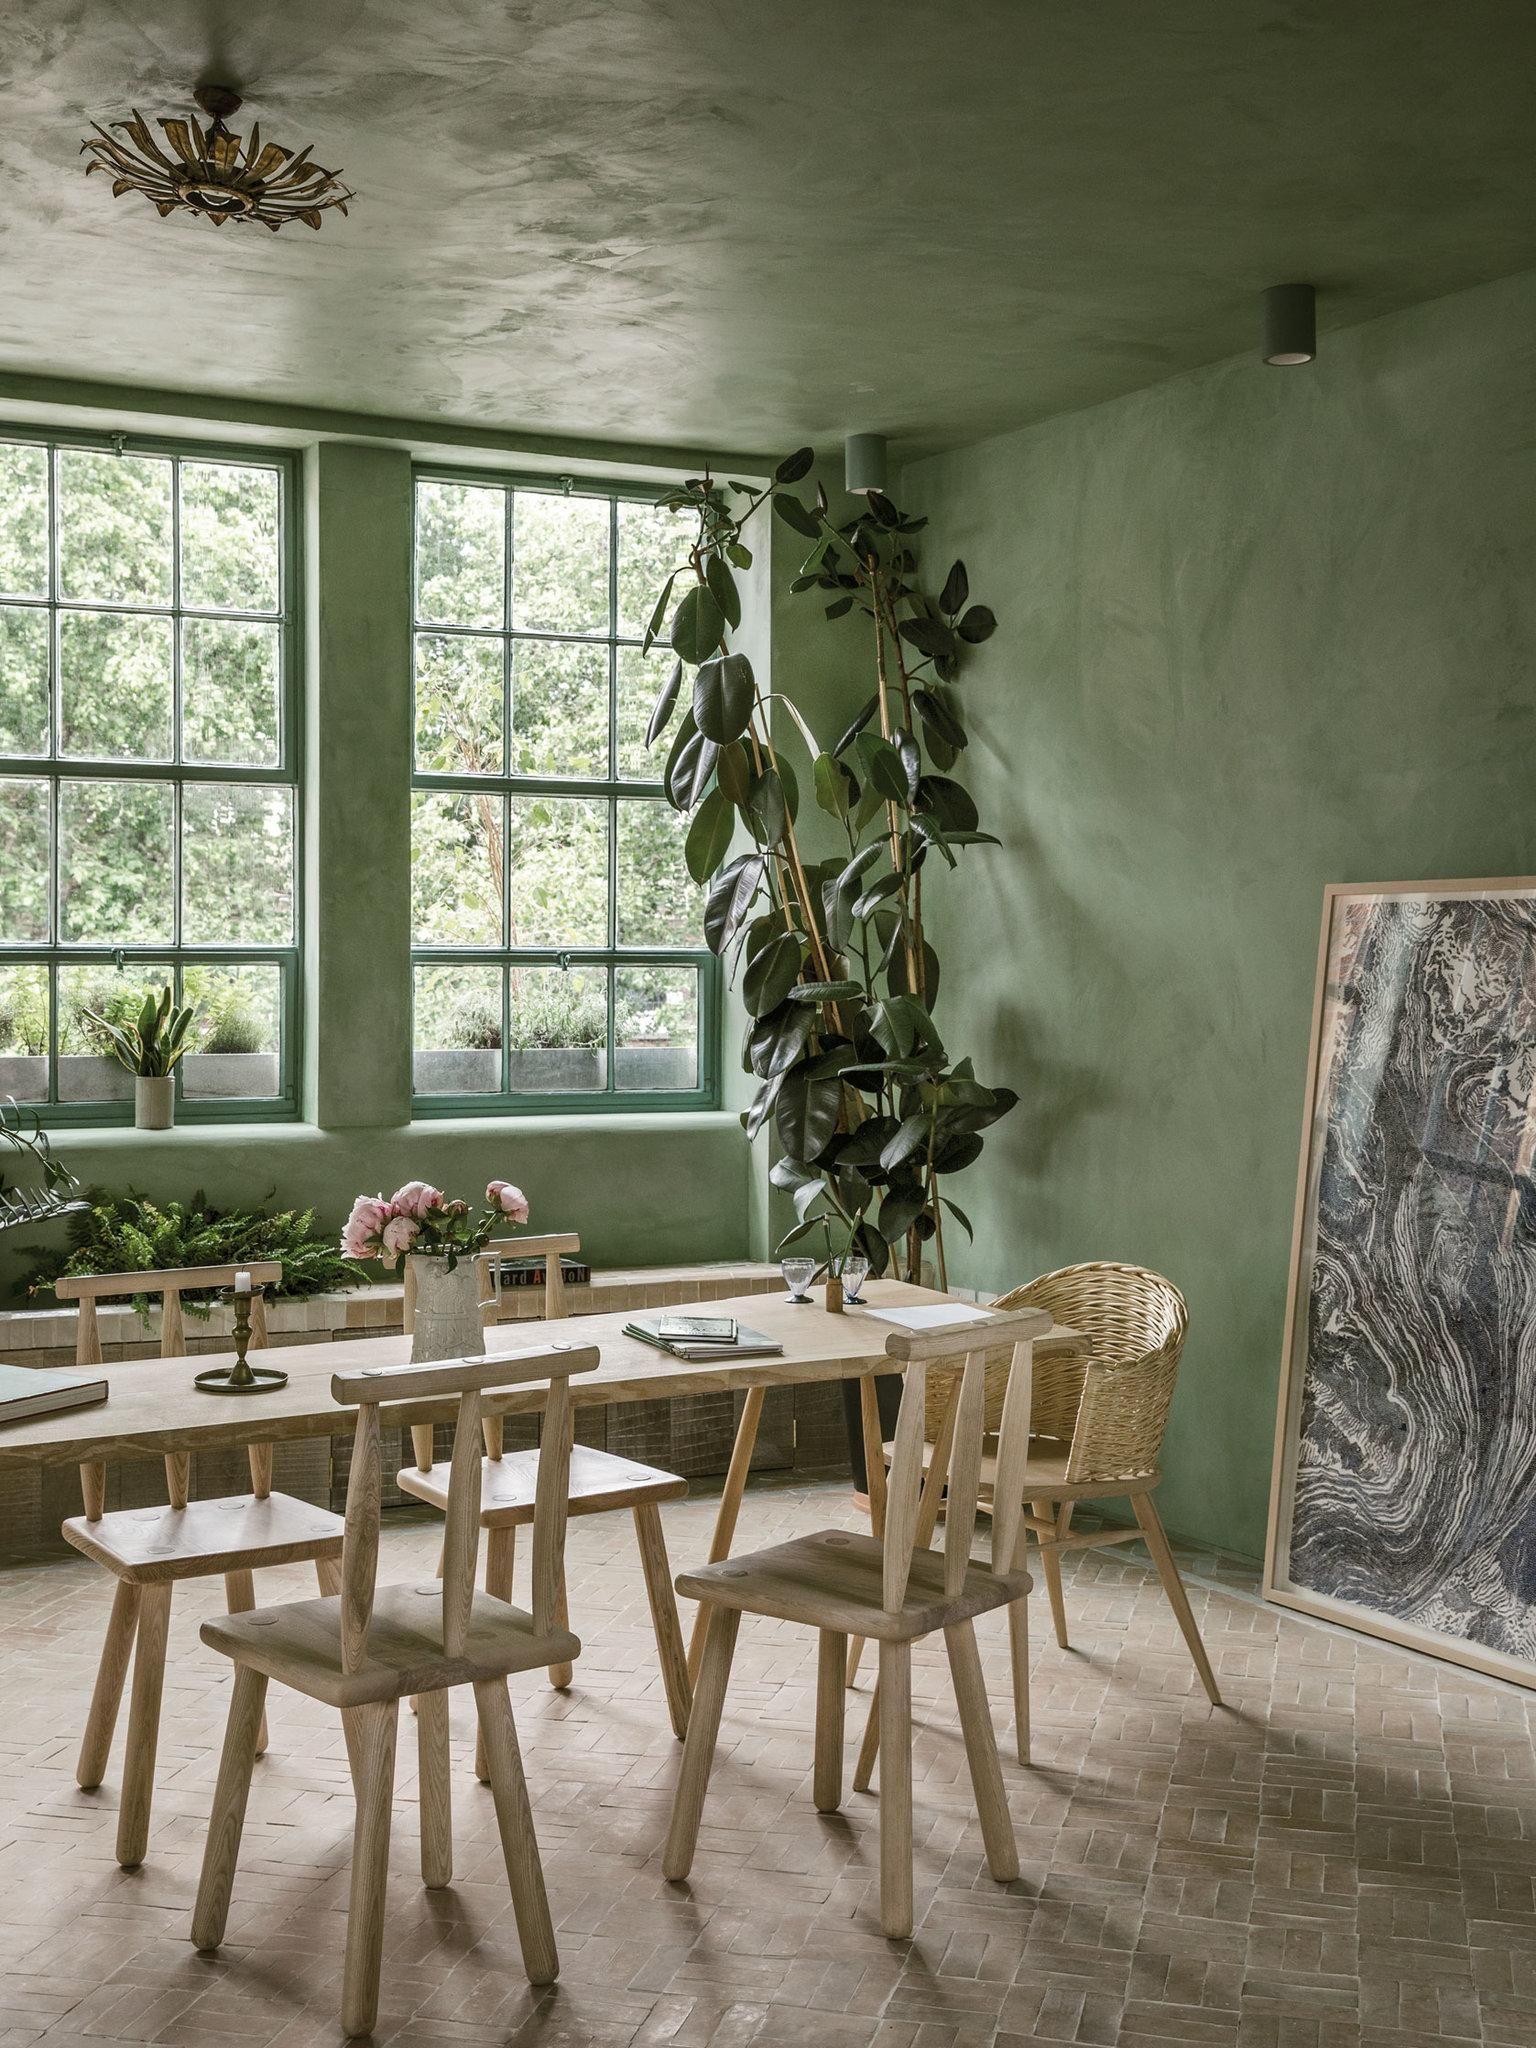 Shoreditch Design Rooms: Inside A Reimagined Shoreditch Loft